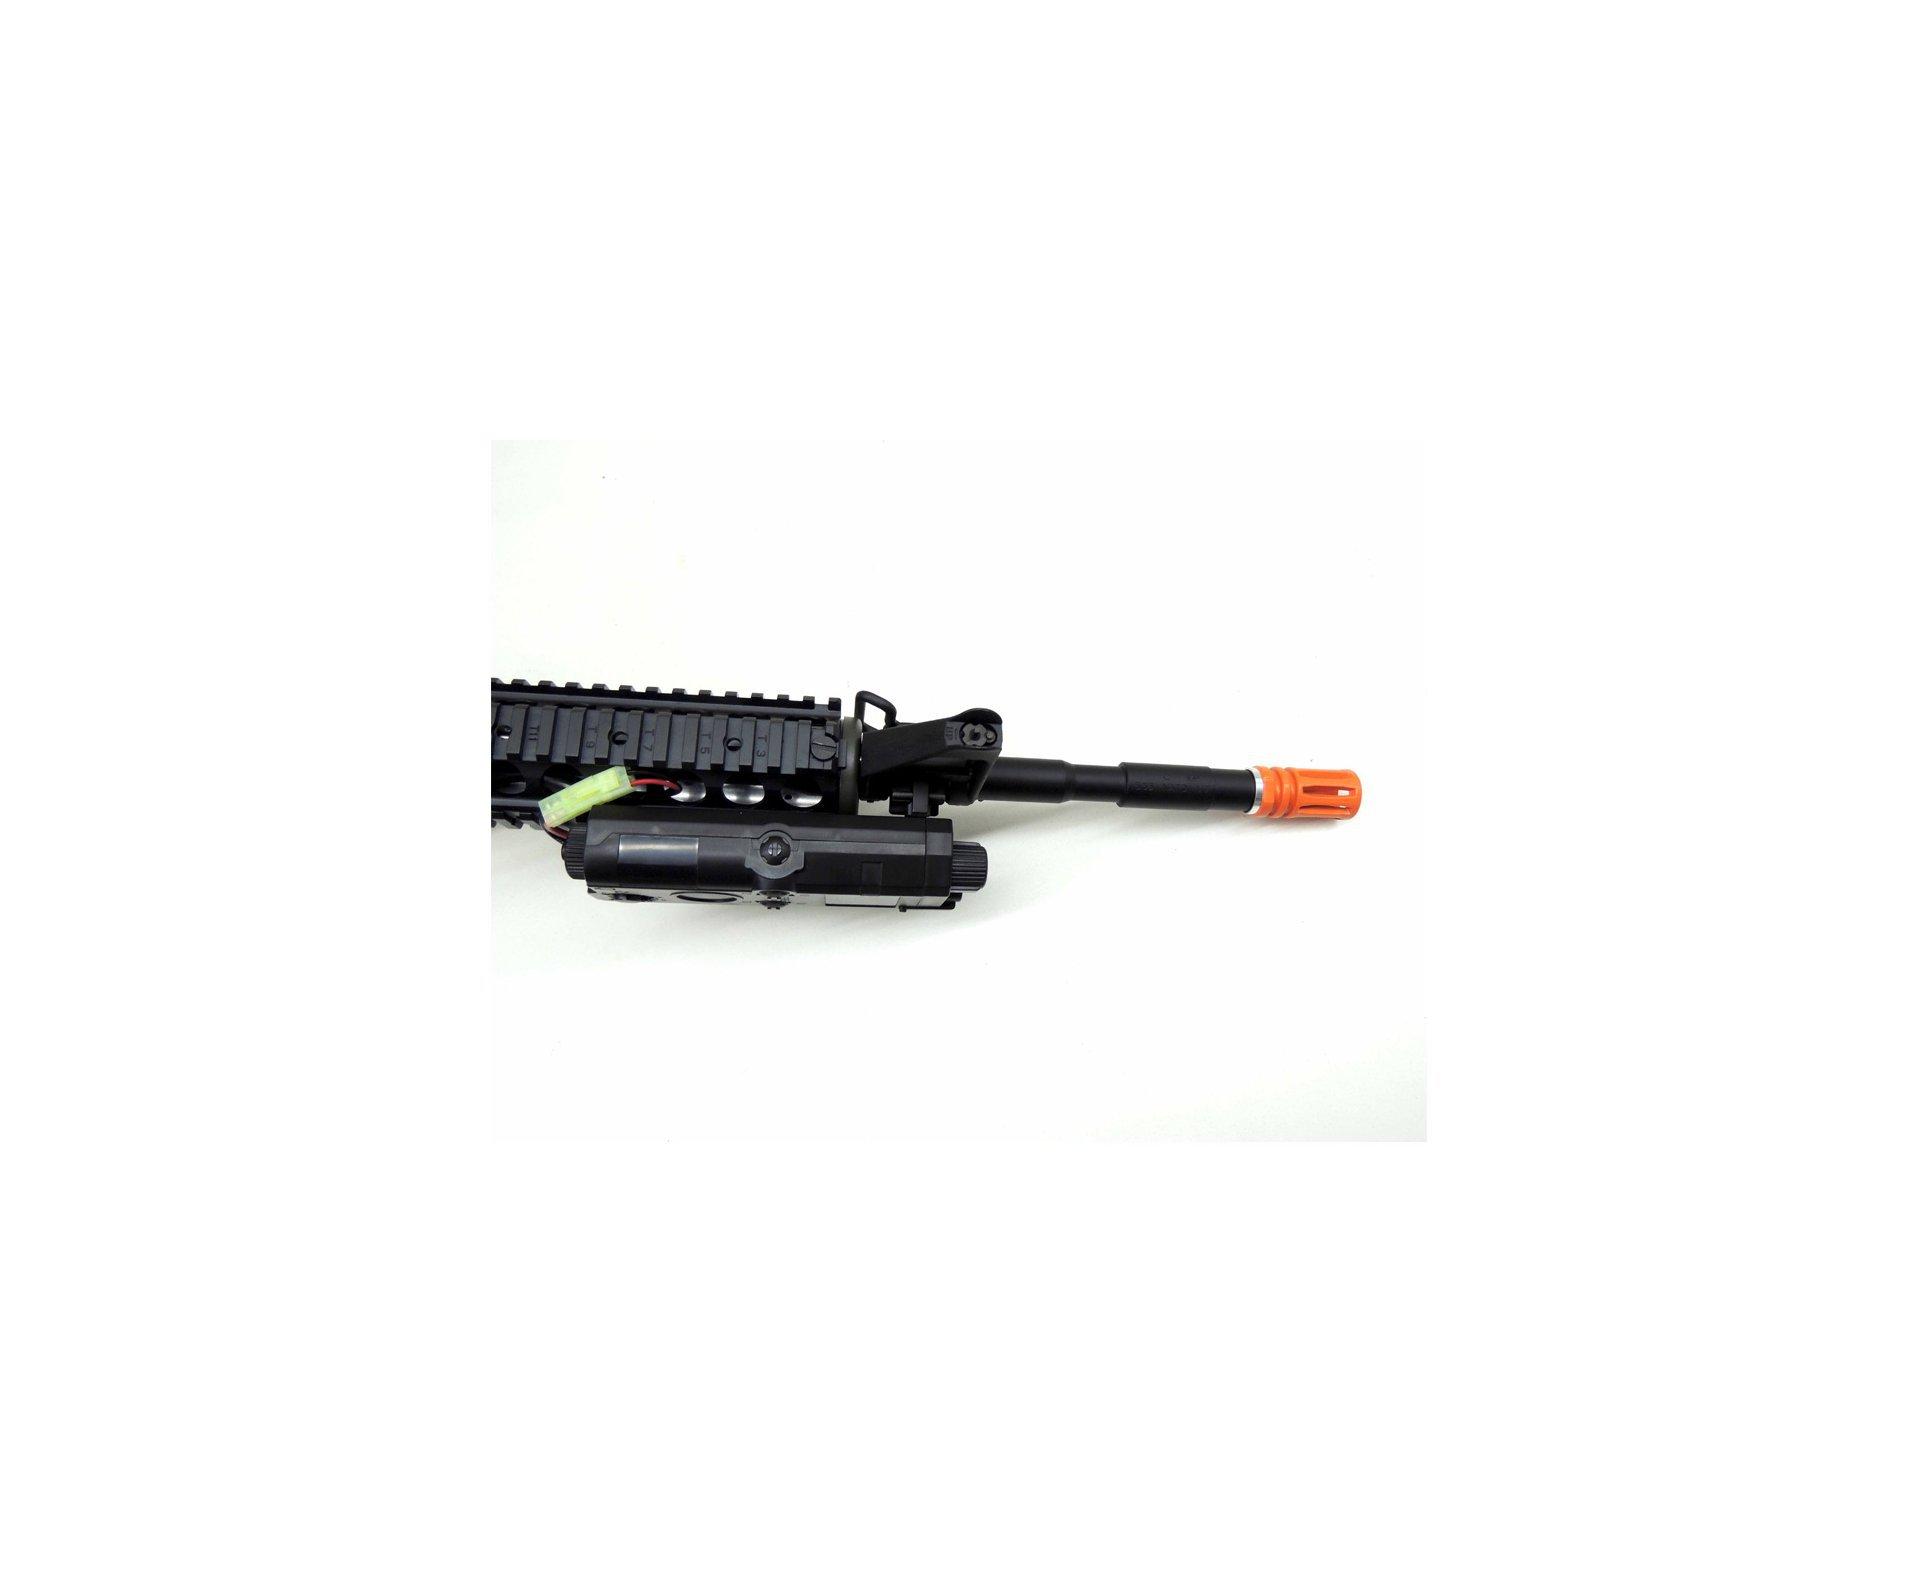 Rifle De Airsoft Colt M4a1ris Cal 6,0mm - King Arms + Farda Marpat Digital Selva Swiss+arms - Tamanho M